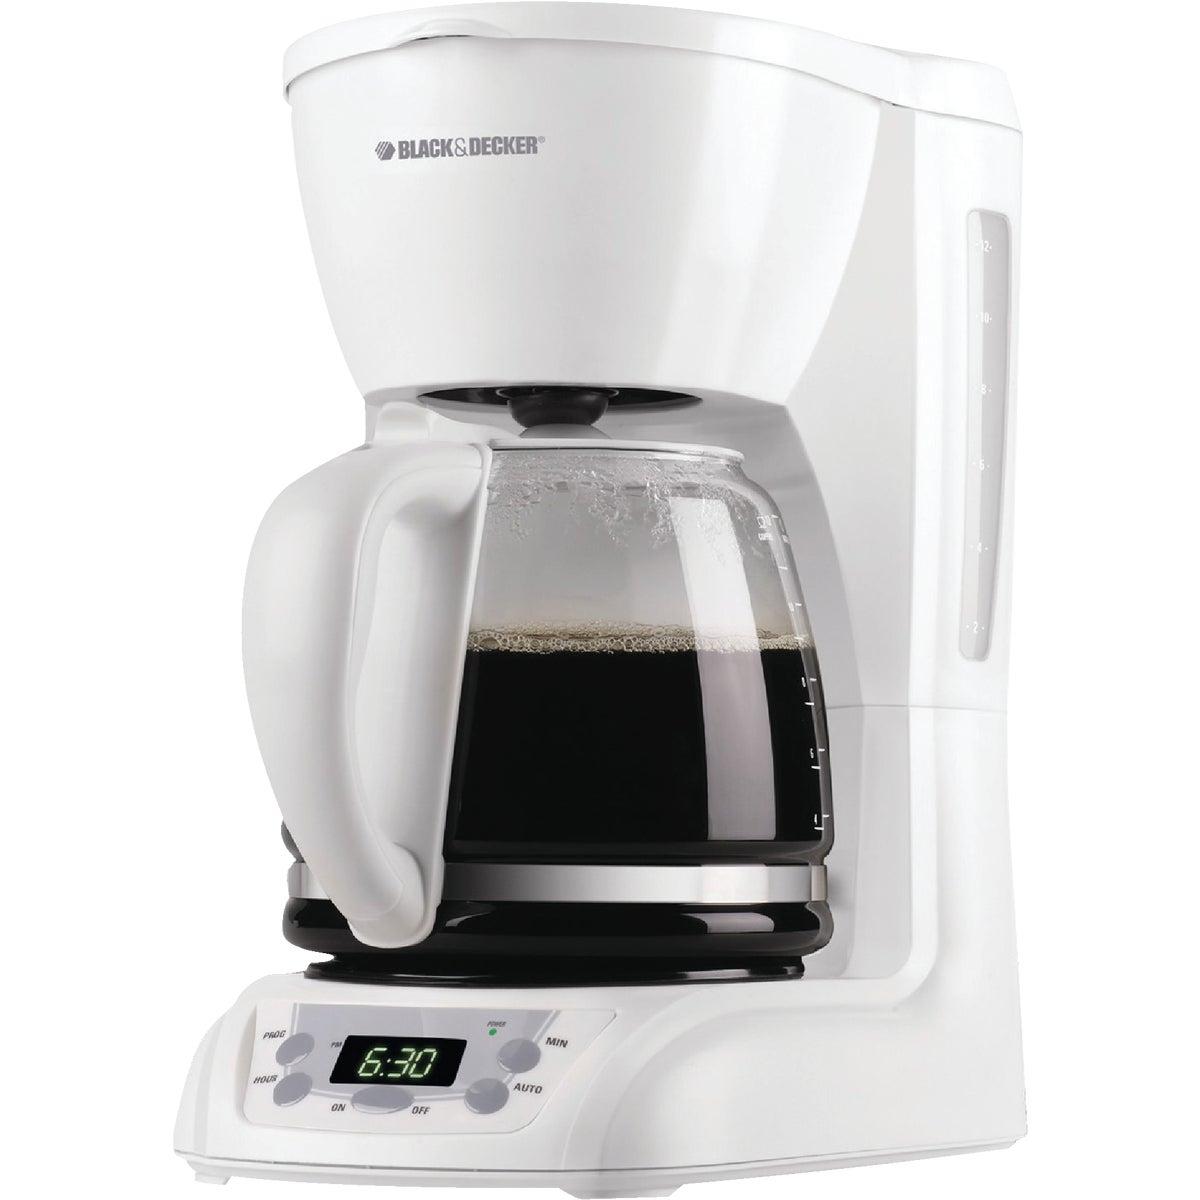 WHT 12-CUP COFFEE MAKER - DLX1050W by Applia      Spectrum